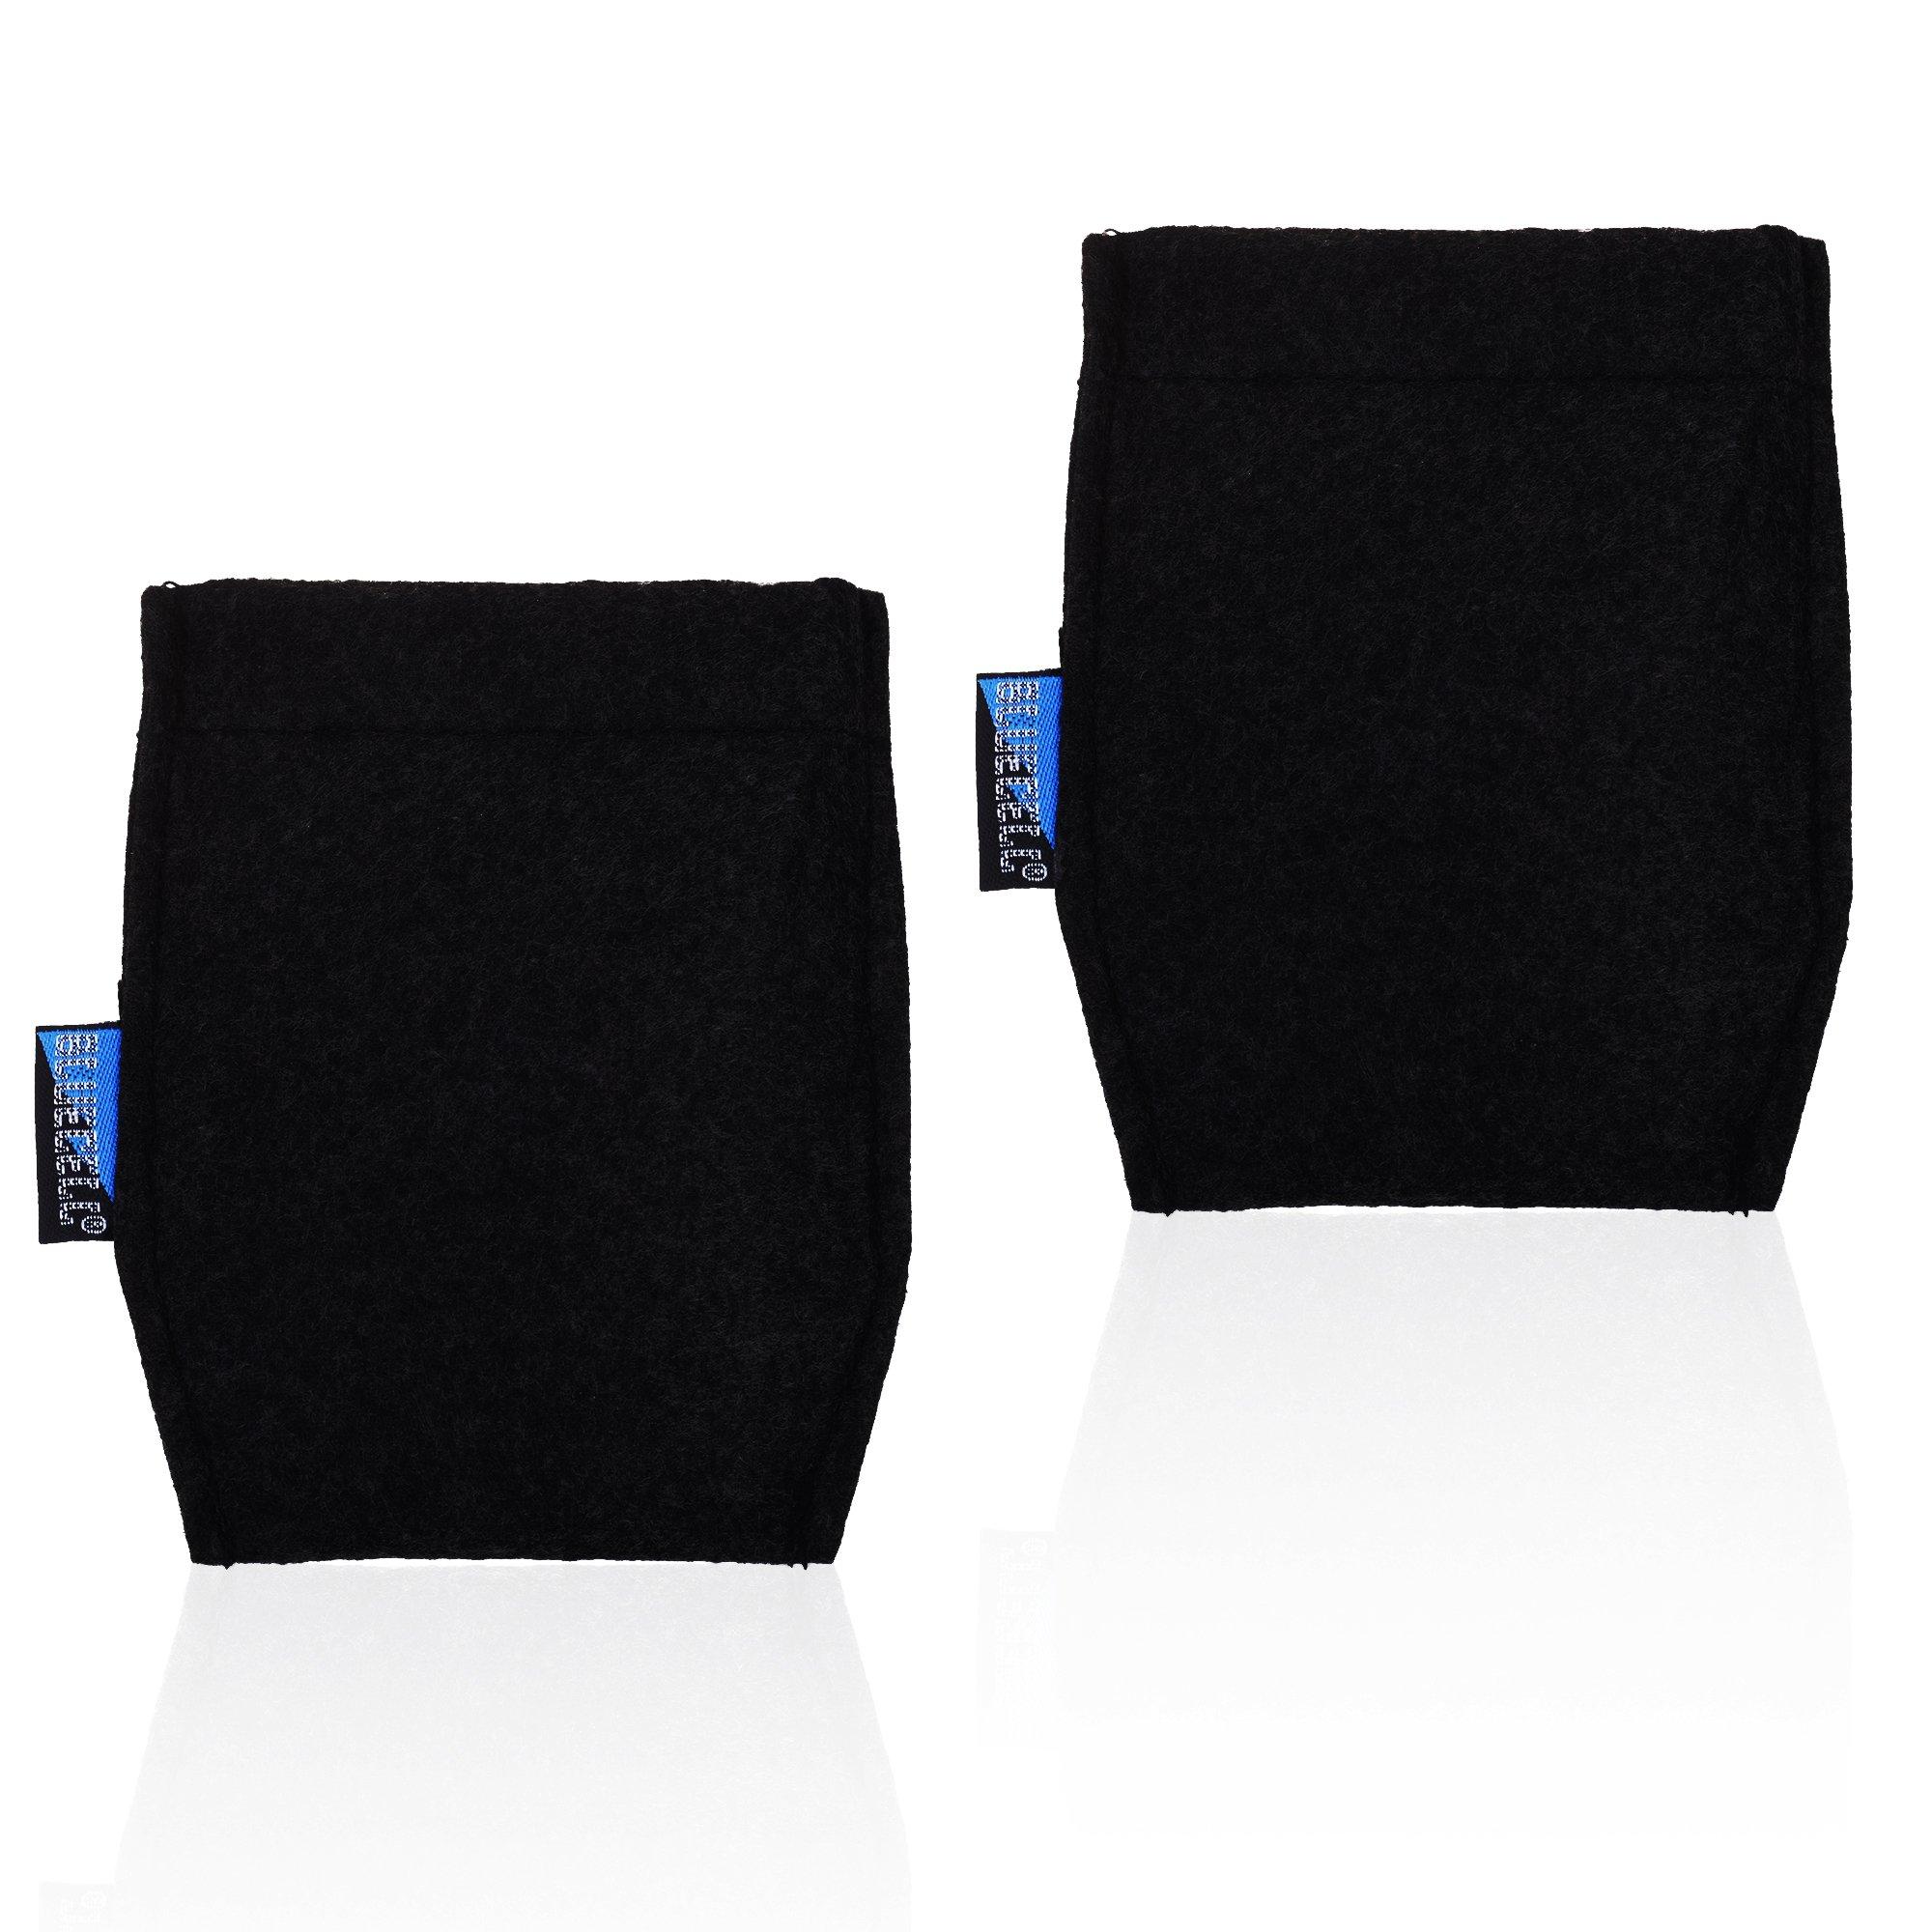 BCP 2 Piece Pocket Square Holder